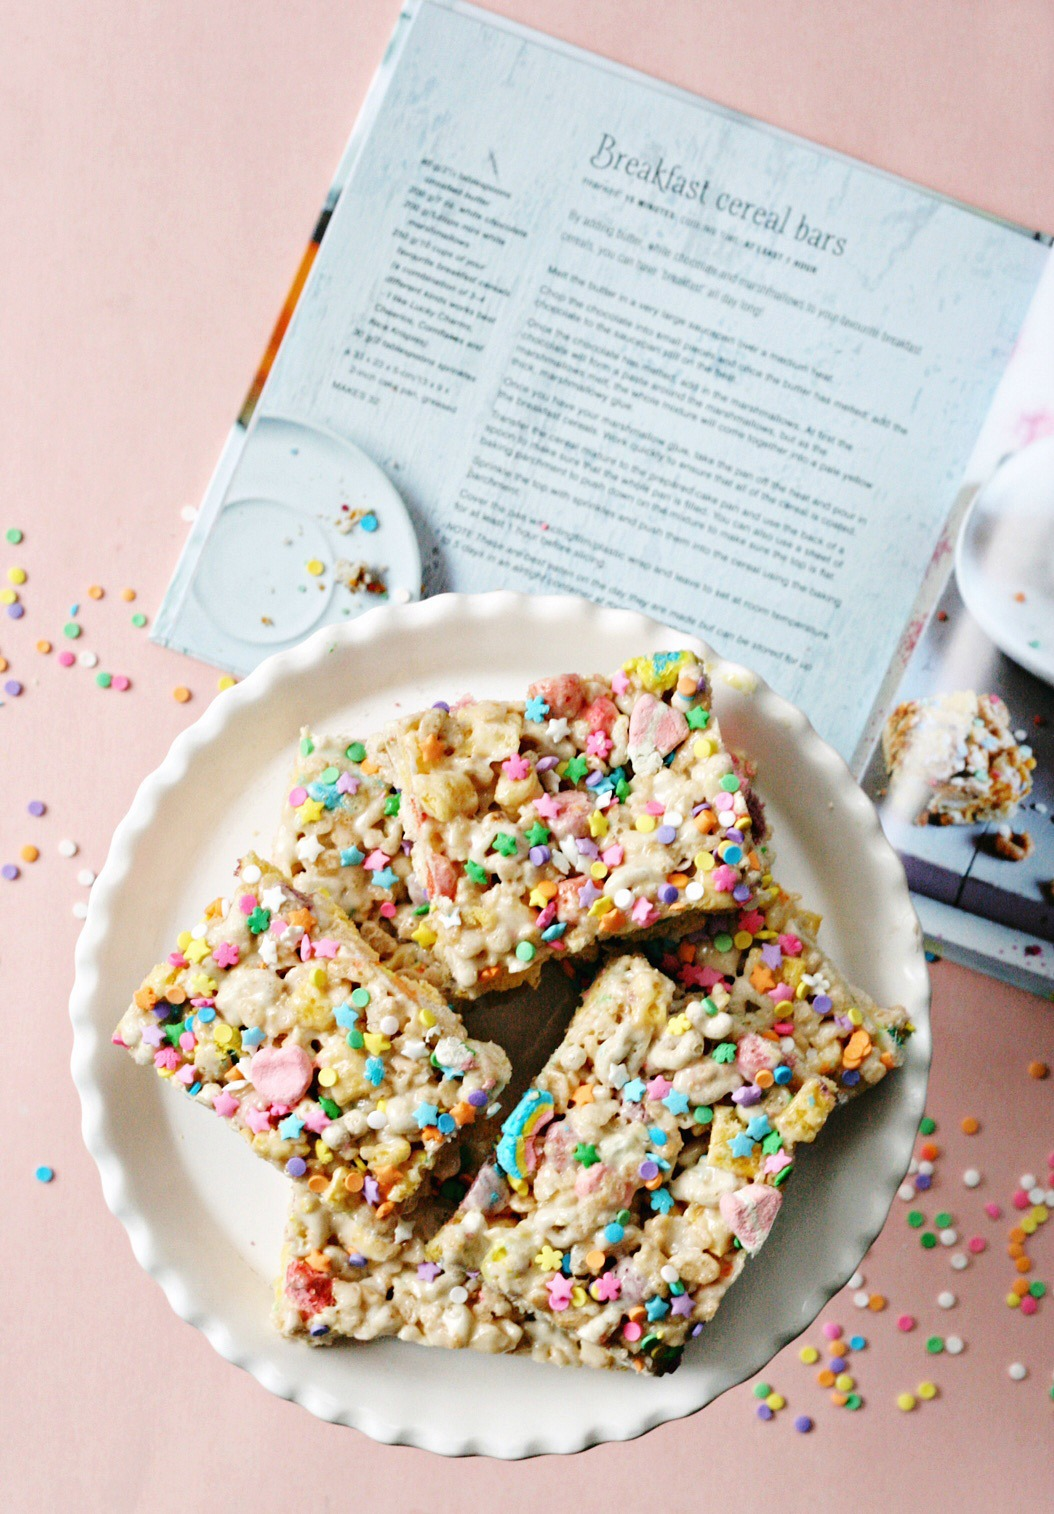 mirace mug cakes breakfast cereal bars